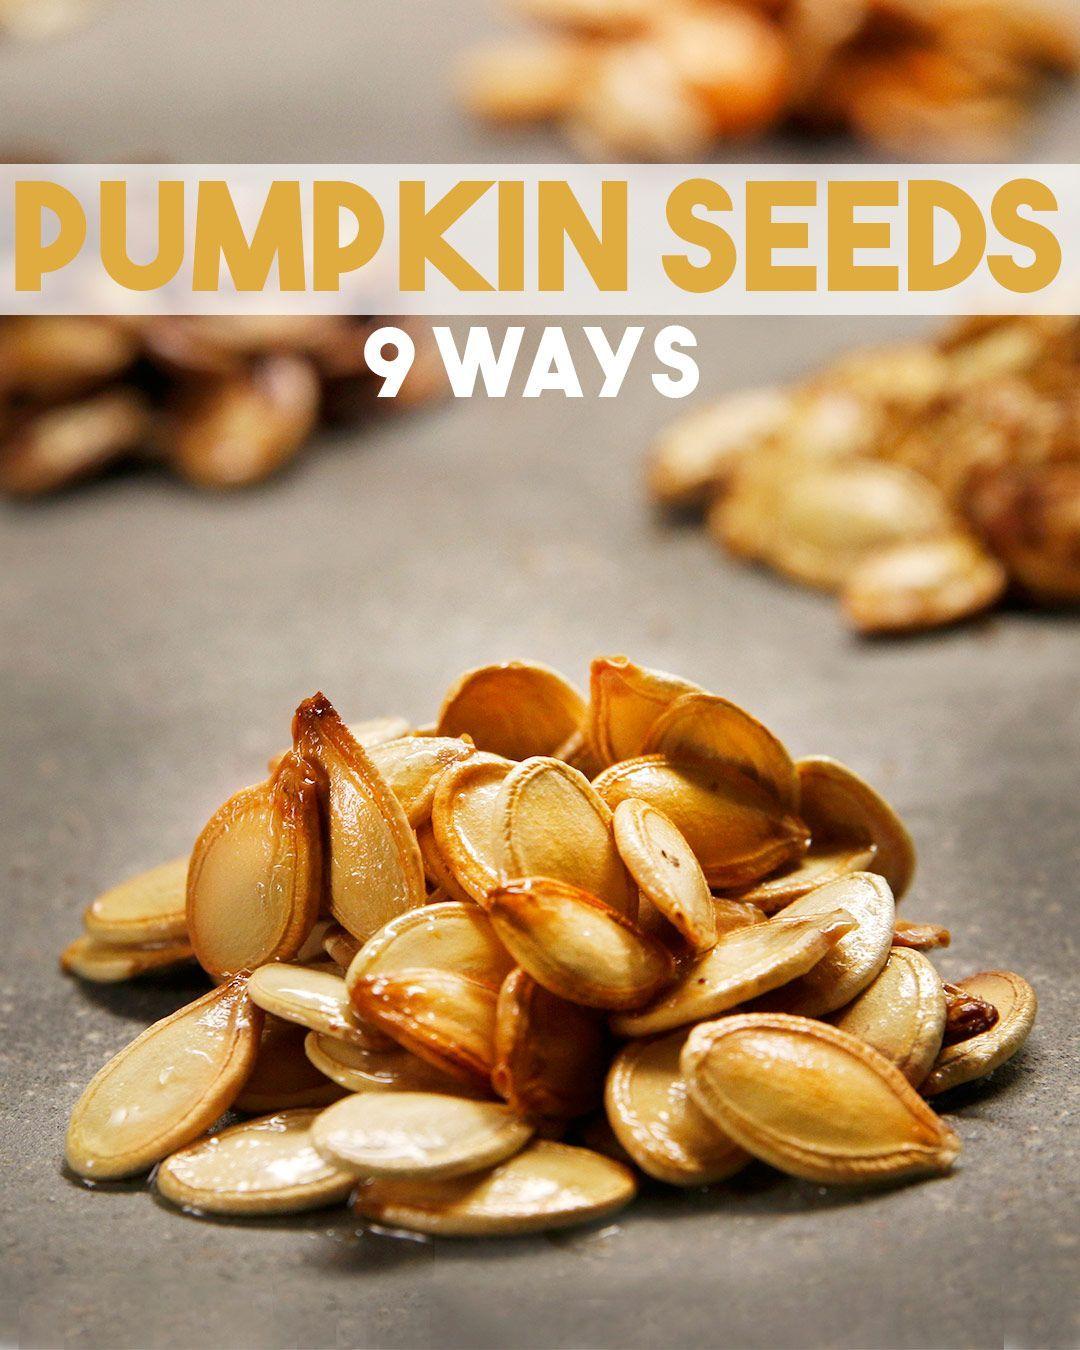 Ways To Make Pumpkin Seeds Taste Fabulous Here's 9 different ways to make pumpkin seeds taste DELICIOUS!Here's 9 different ways to make pumpkin seeds taste DELICIOUS!